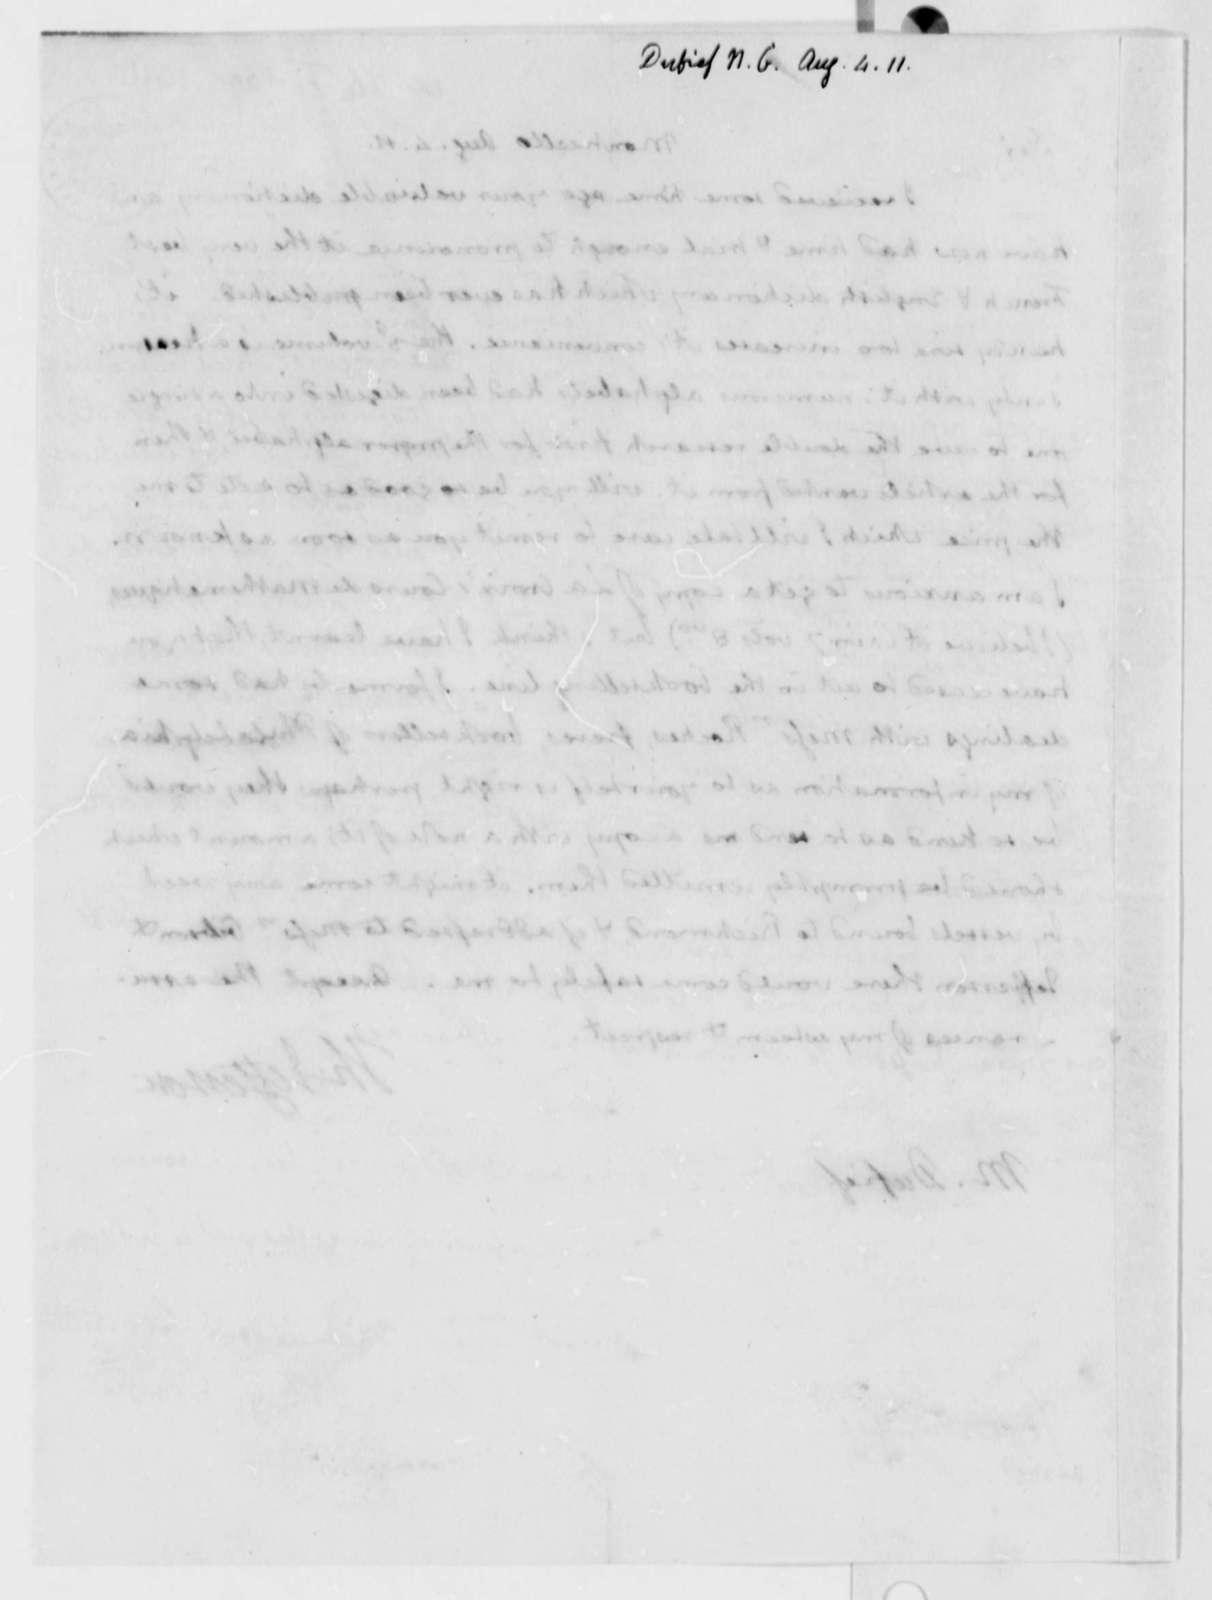 Thomas Jefferson to Nicholas Gouin Dufief, August 4, 1811